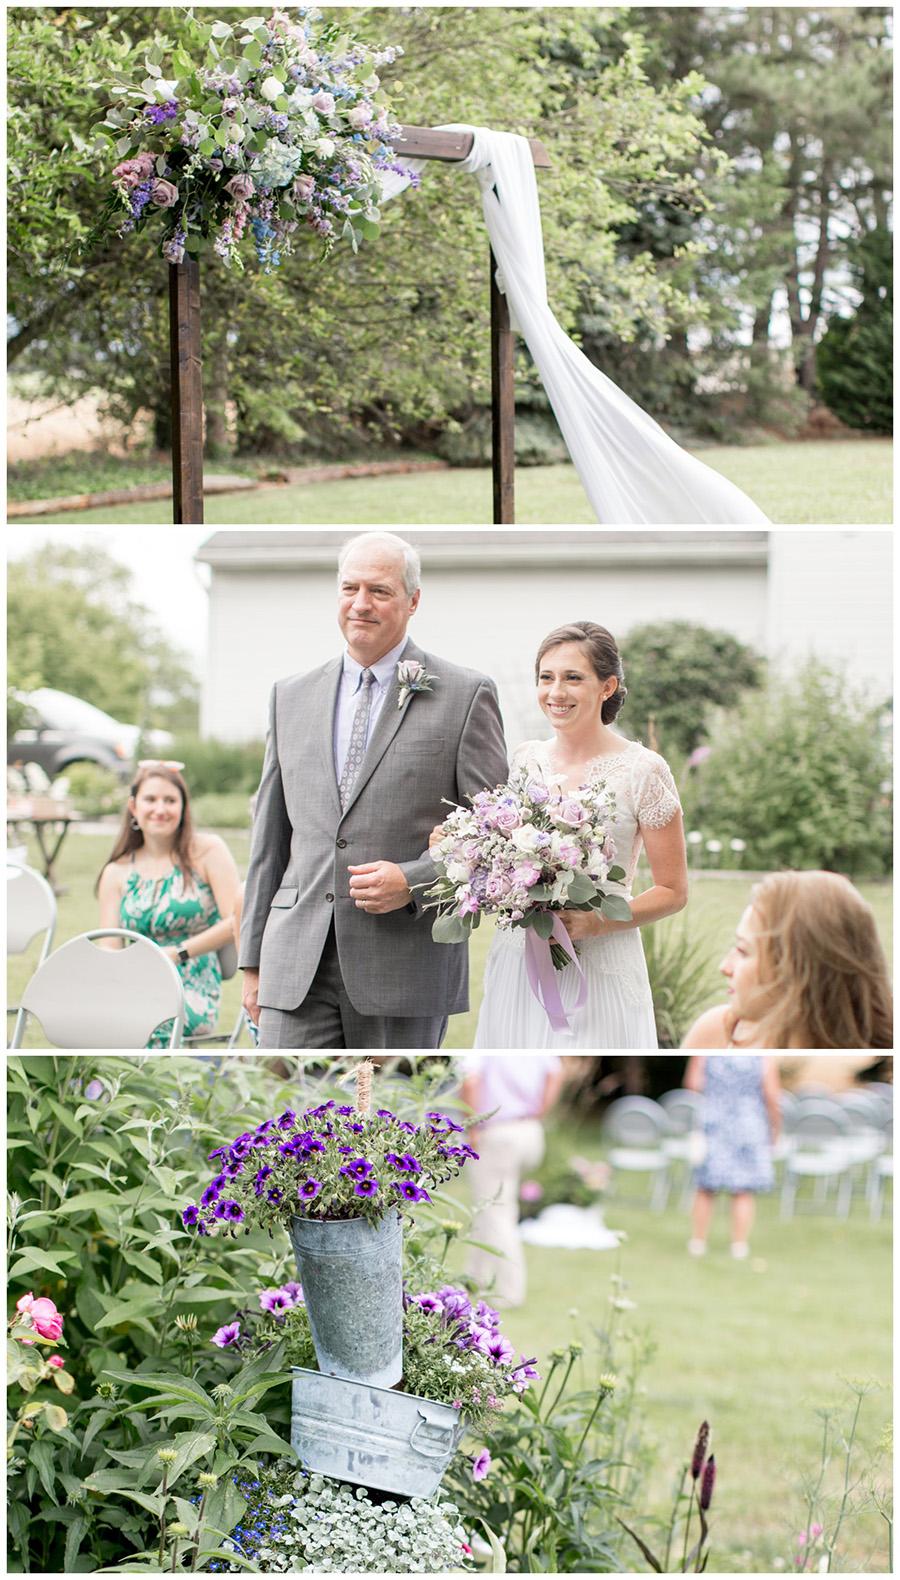 wedding ceremony arch in the bride's backyard